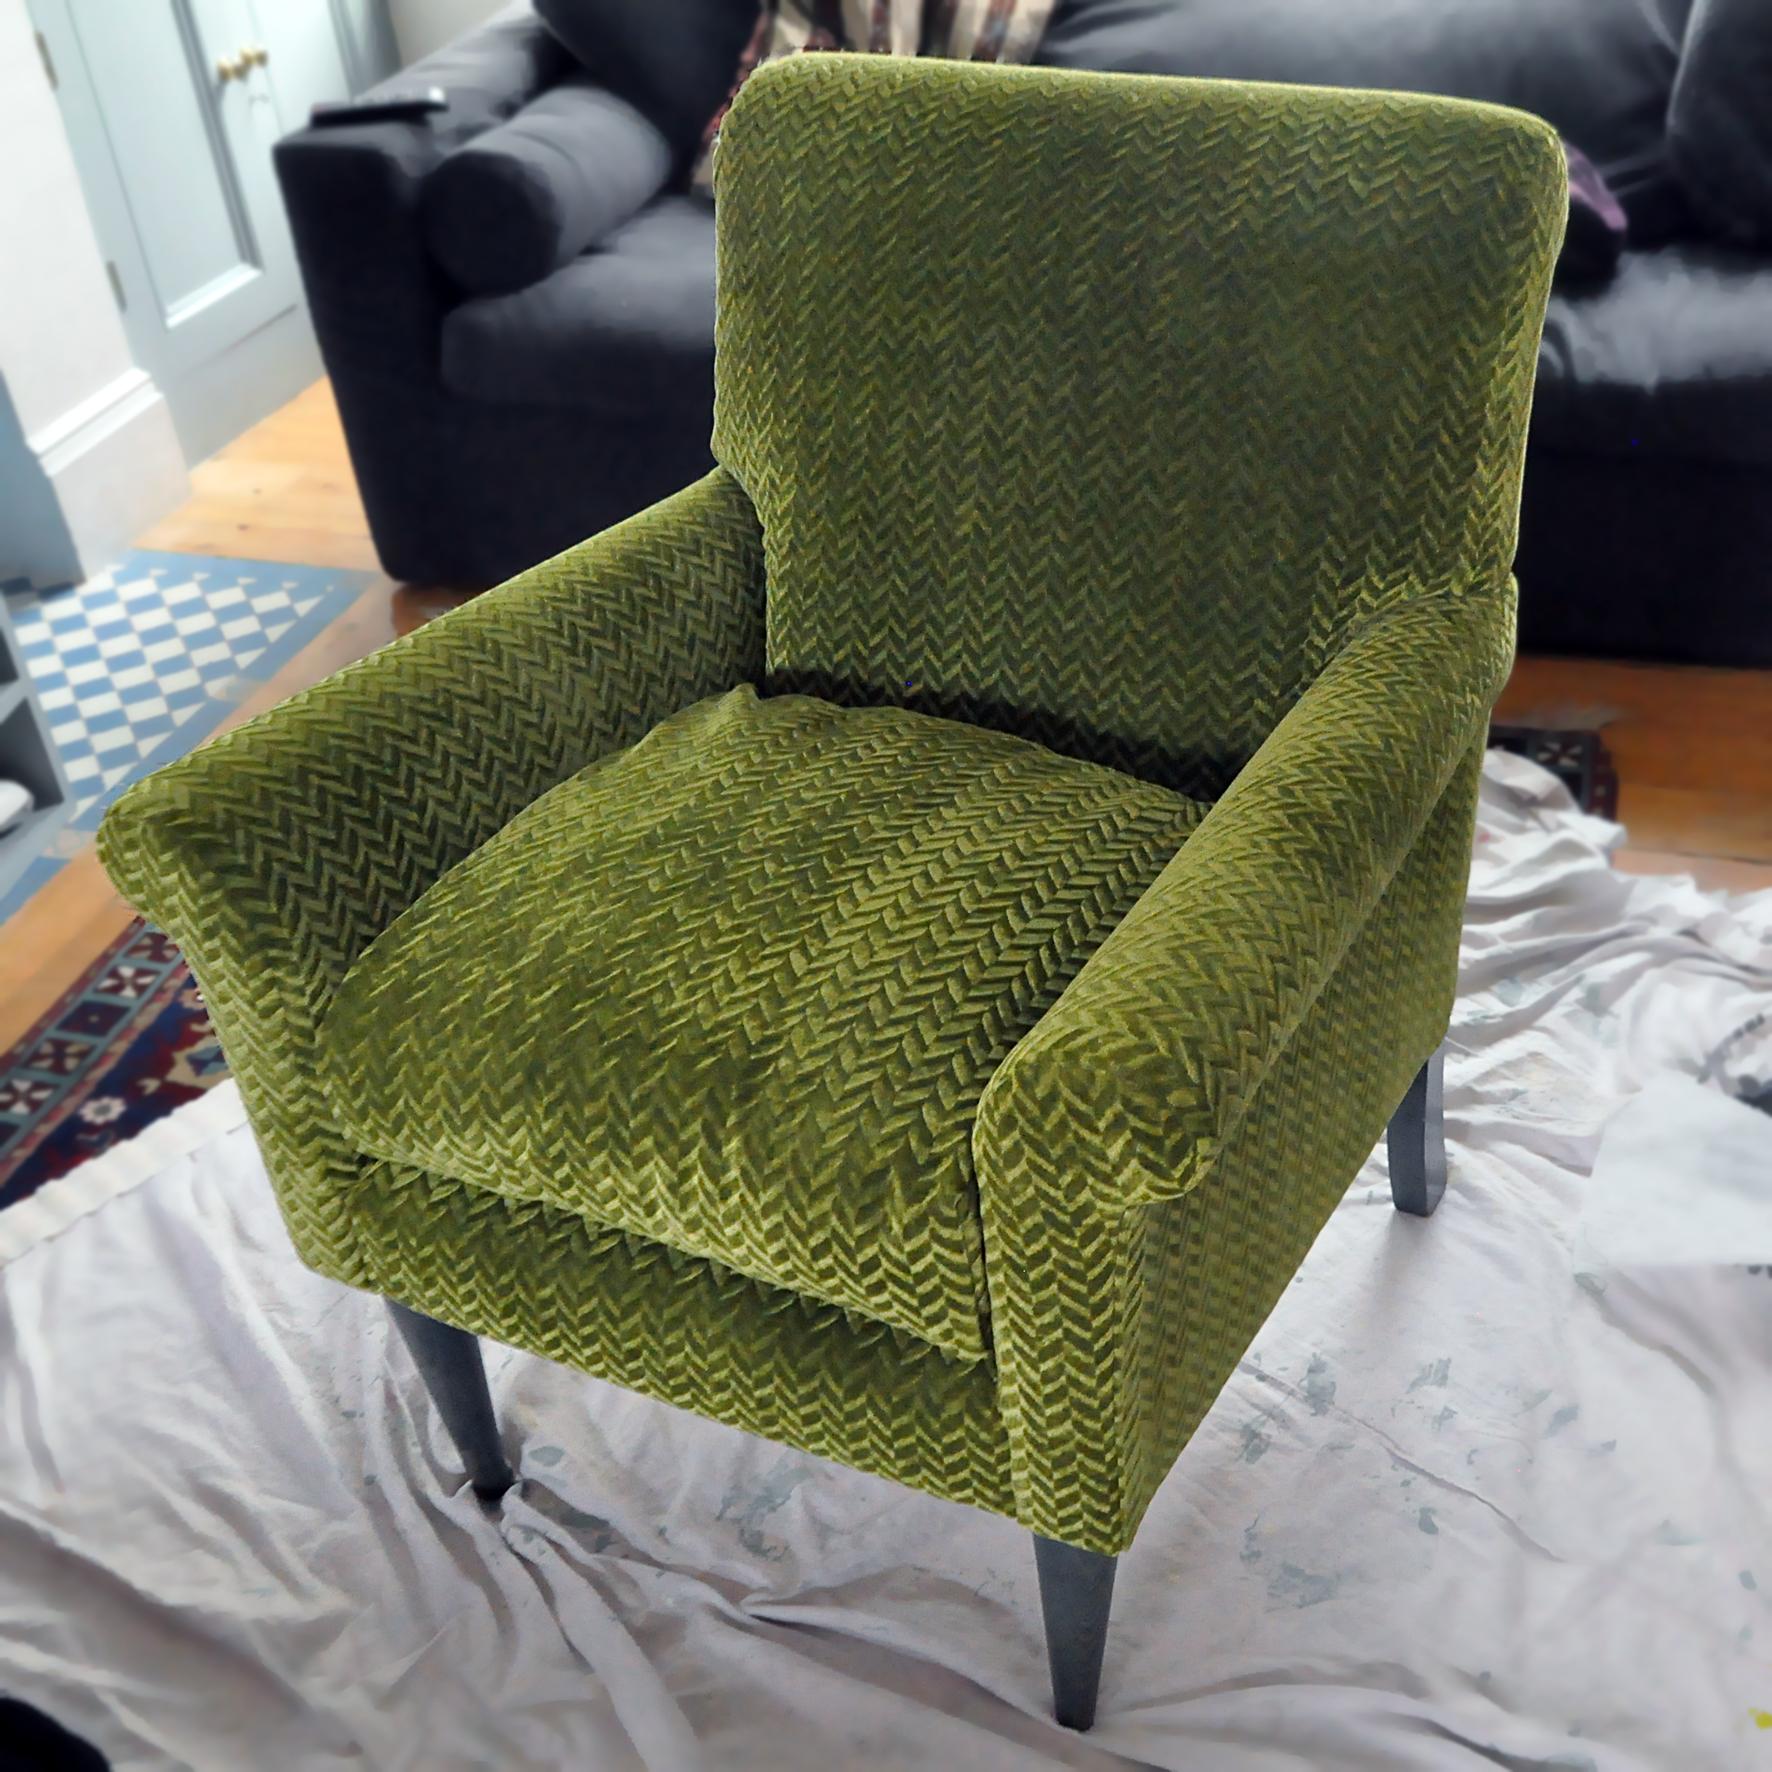 Reupholstered Armchair. Dougie Scott